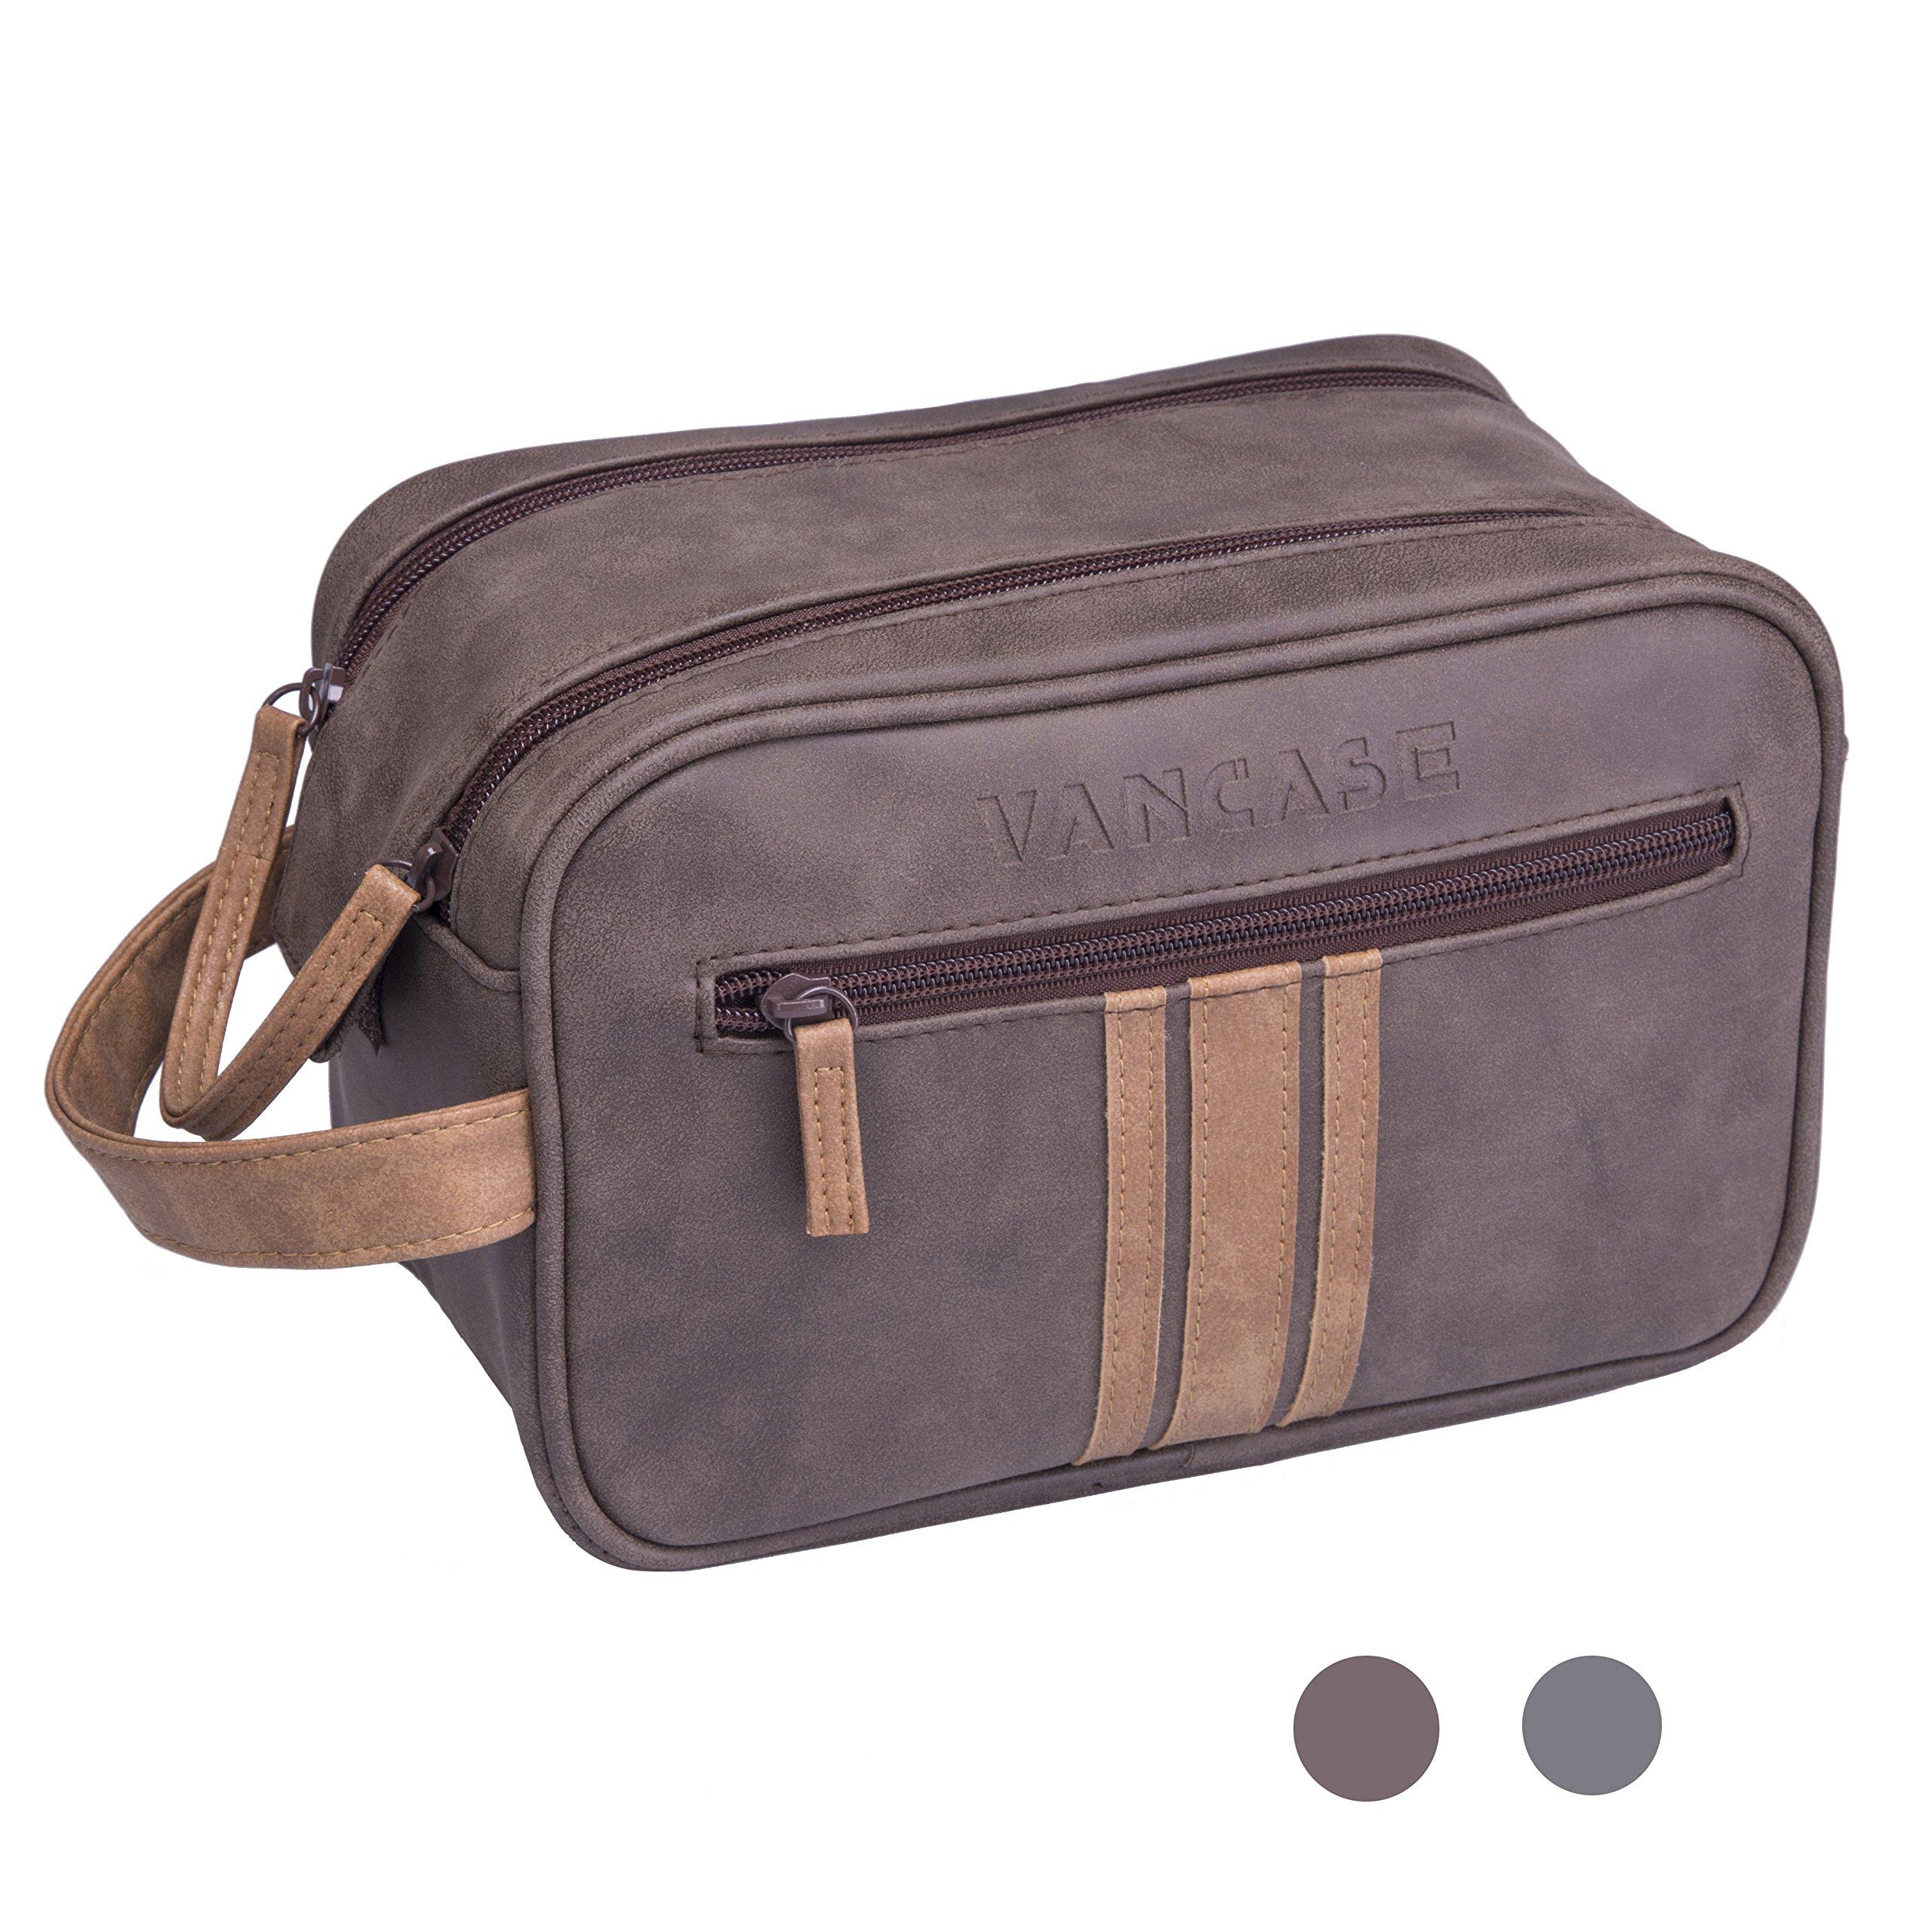 Travel Toiletry Bag for Men, Vancase Vintage Leather Dopp Kit, Large  Waterproof Shaving bags 8fa3d8240d